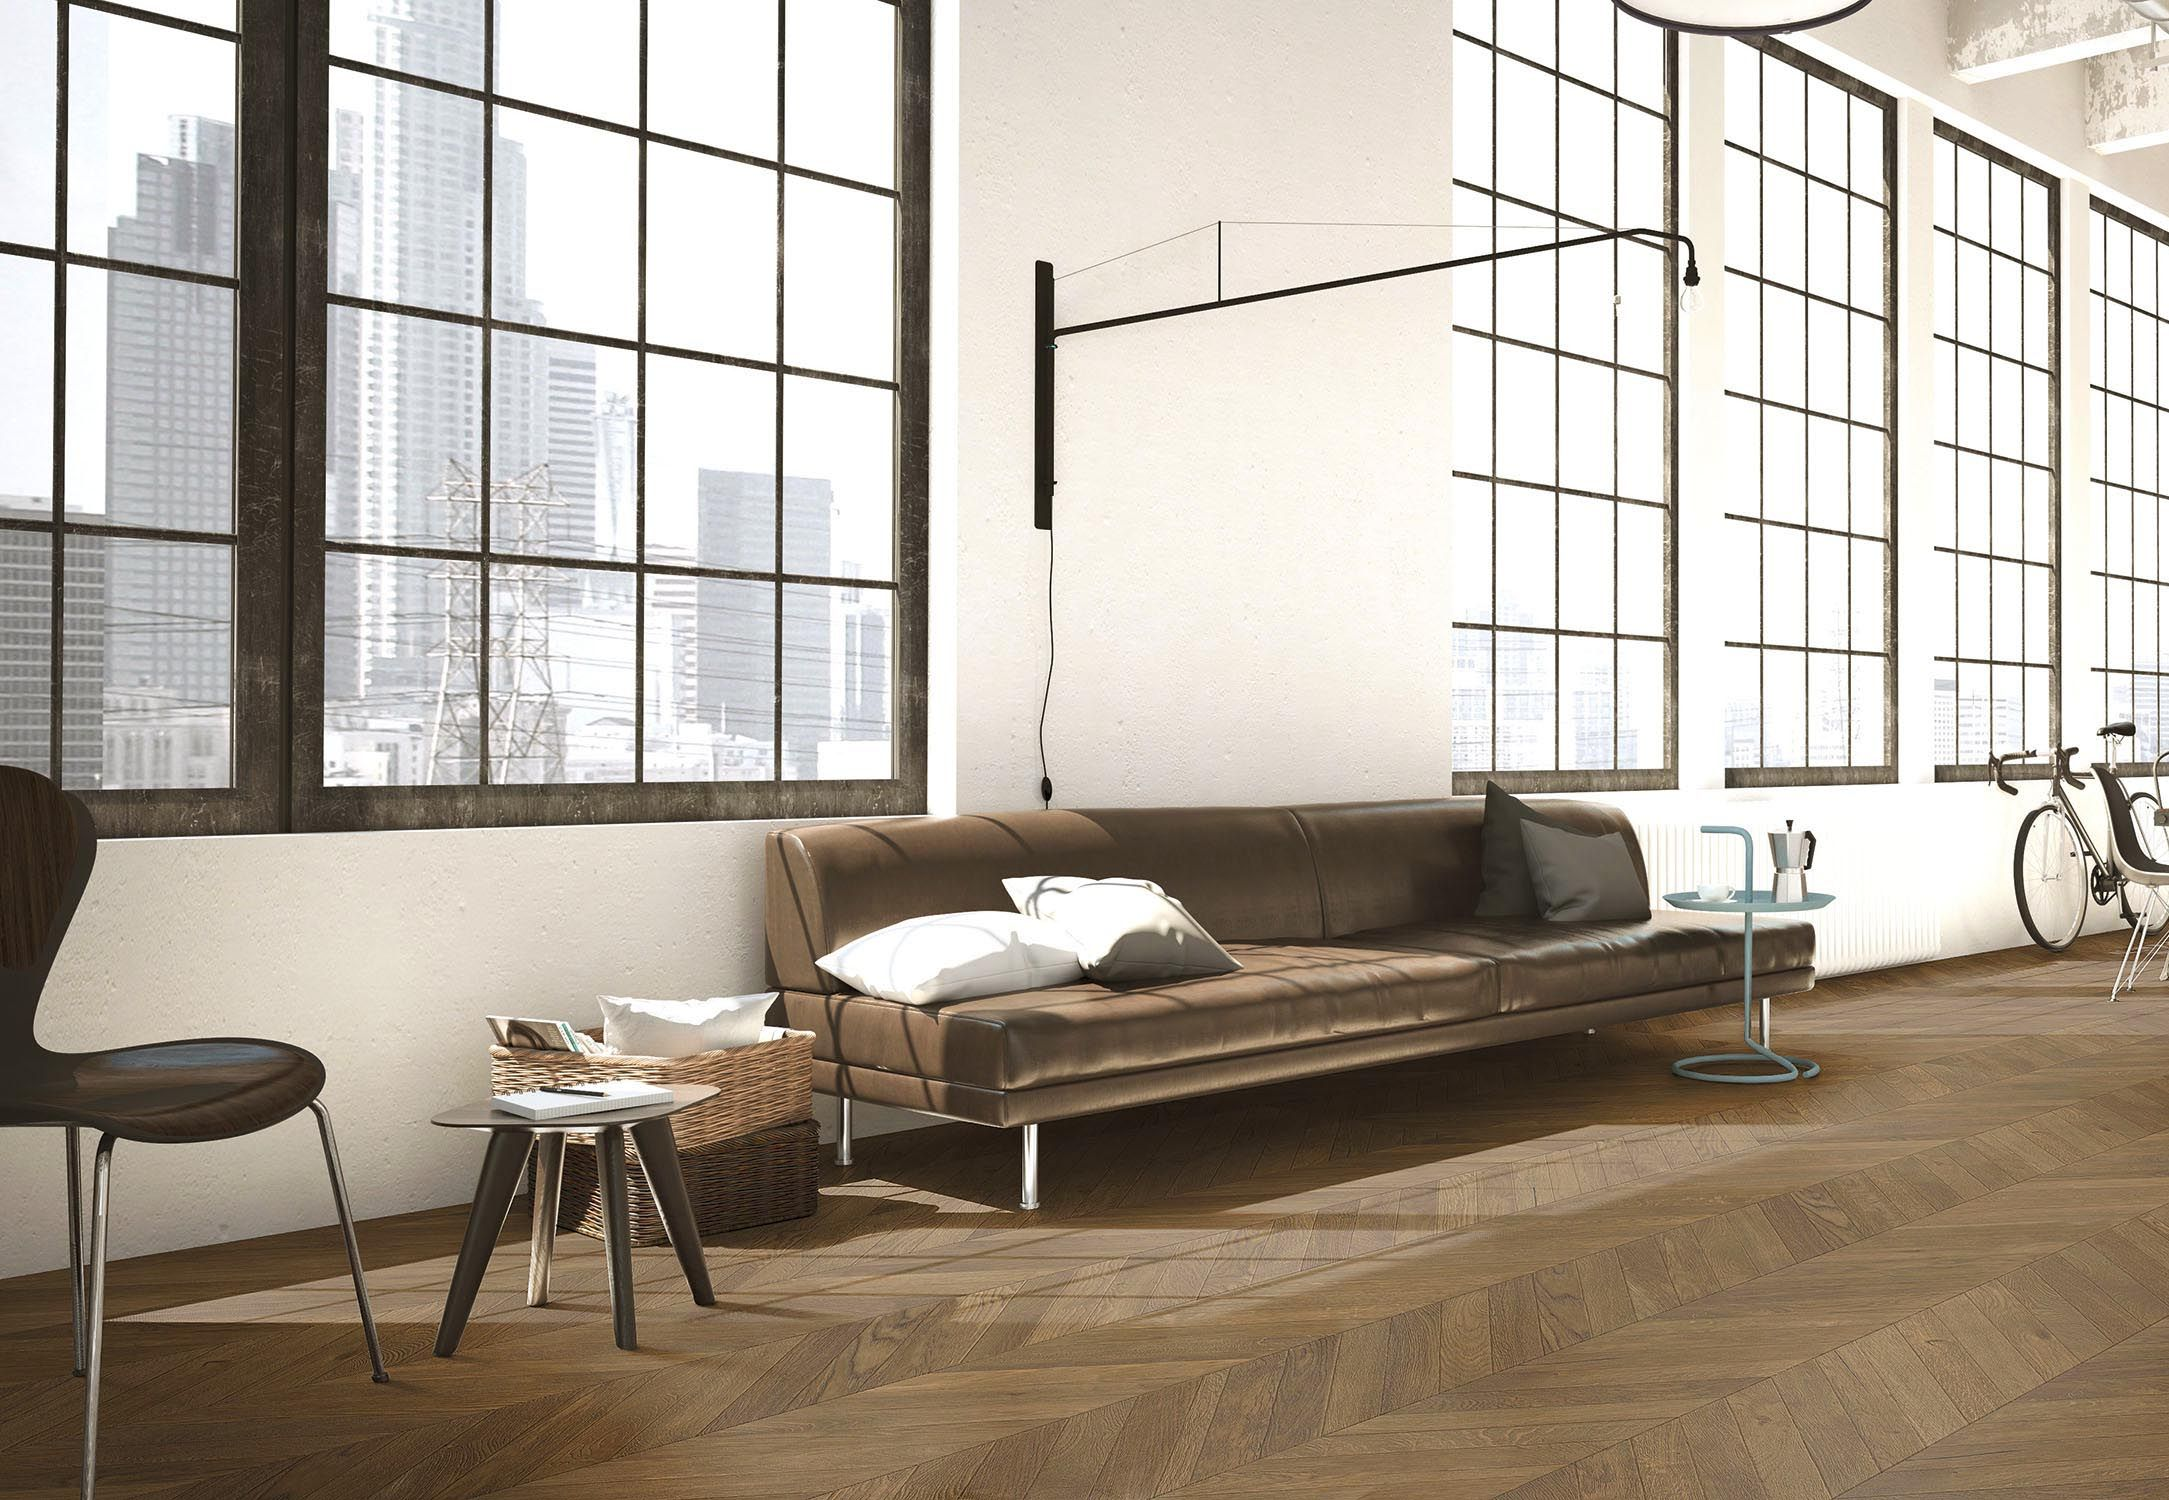 Produkte Grosses Sortiment An Bodenbelagen Der Parkett Riese Koln Industrie Stil Inneneinrichtung Moderne Wohnzimmerideen Kaminbau